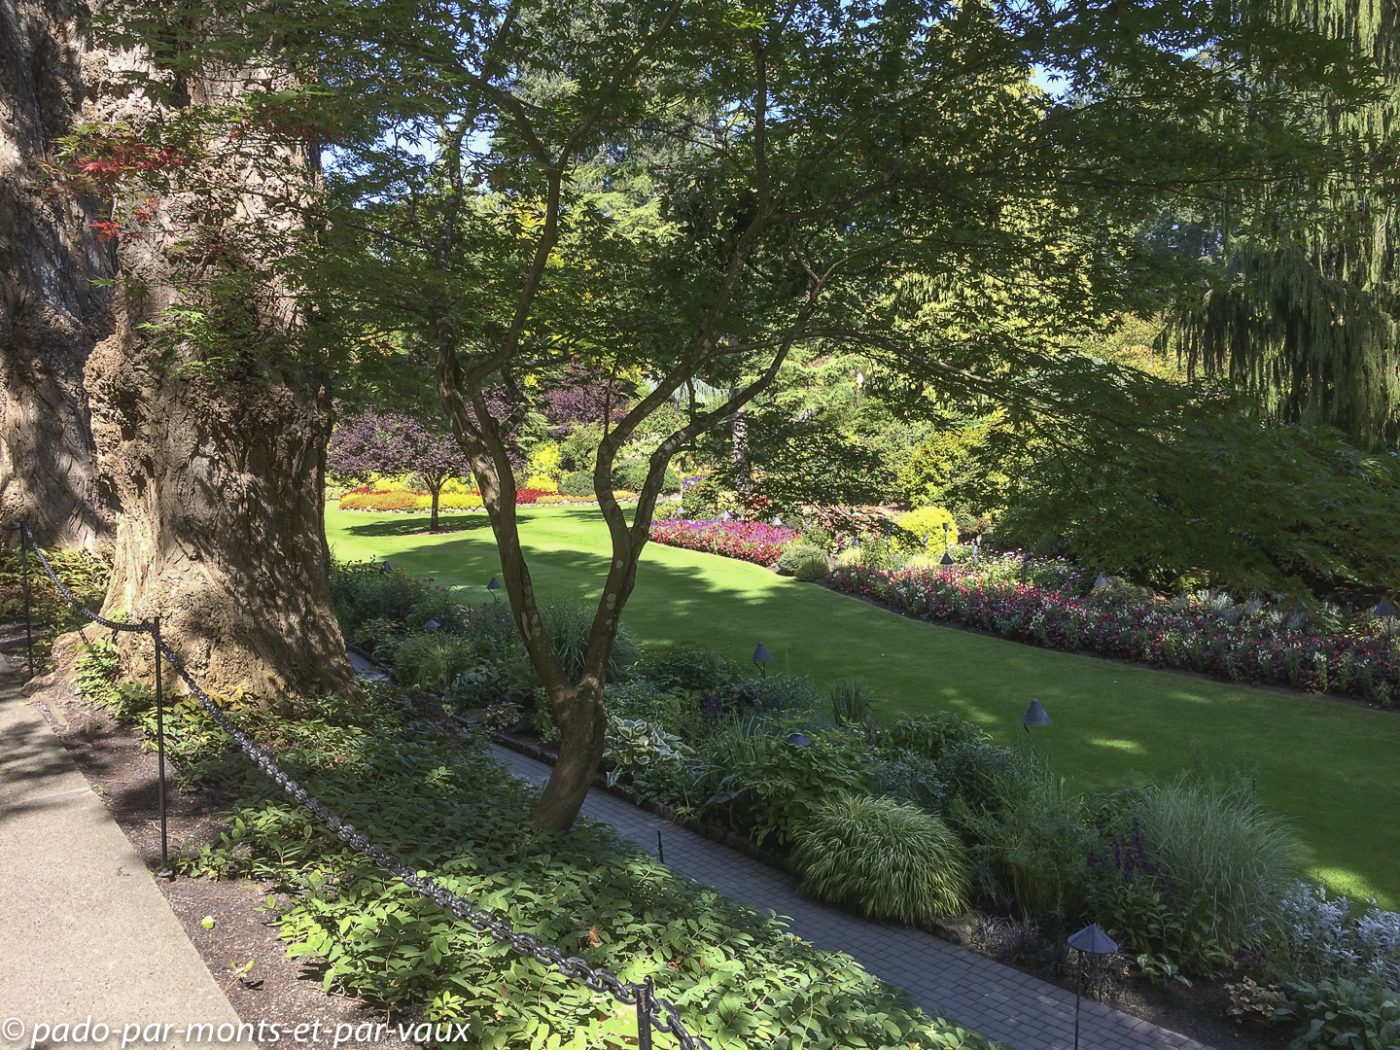 2018 The Butchart gardens